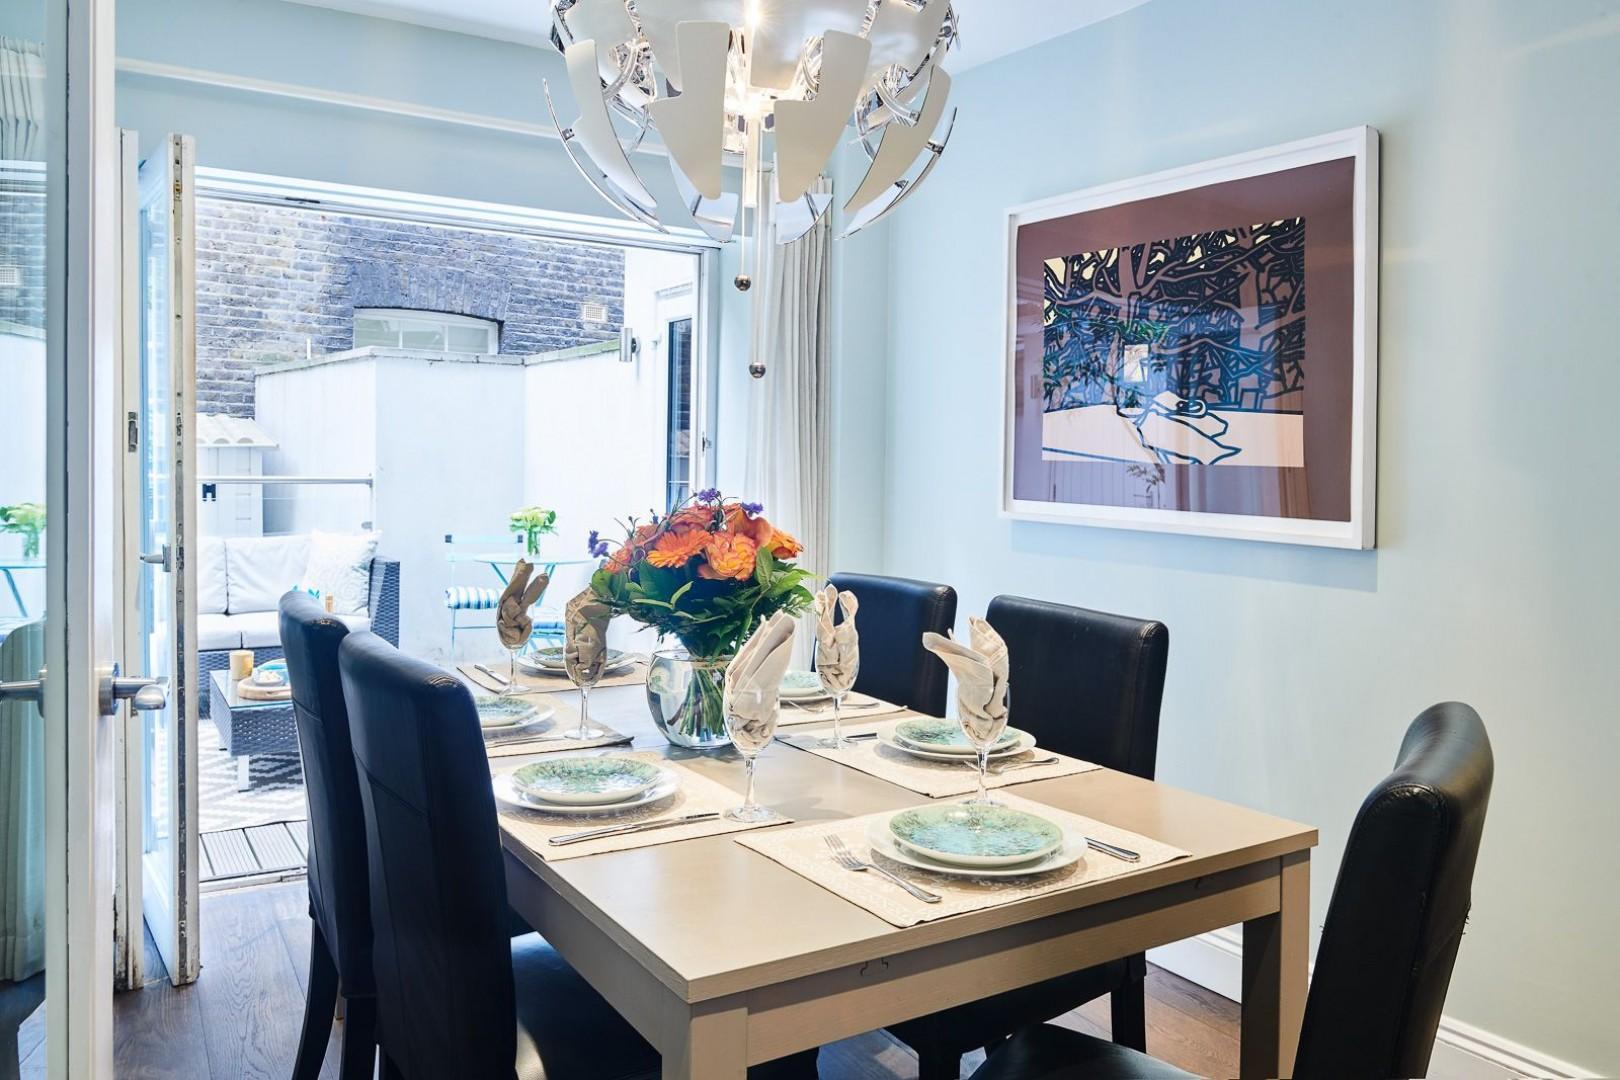 Natural light fills the dining room